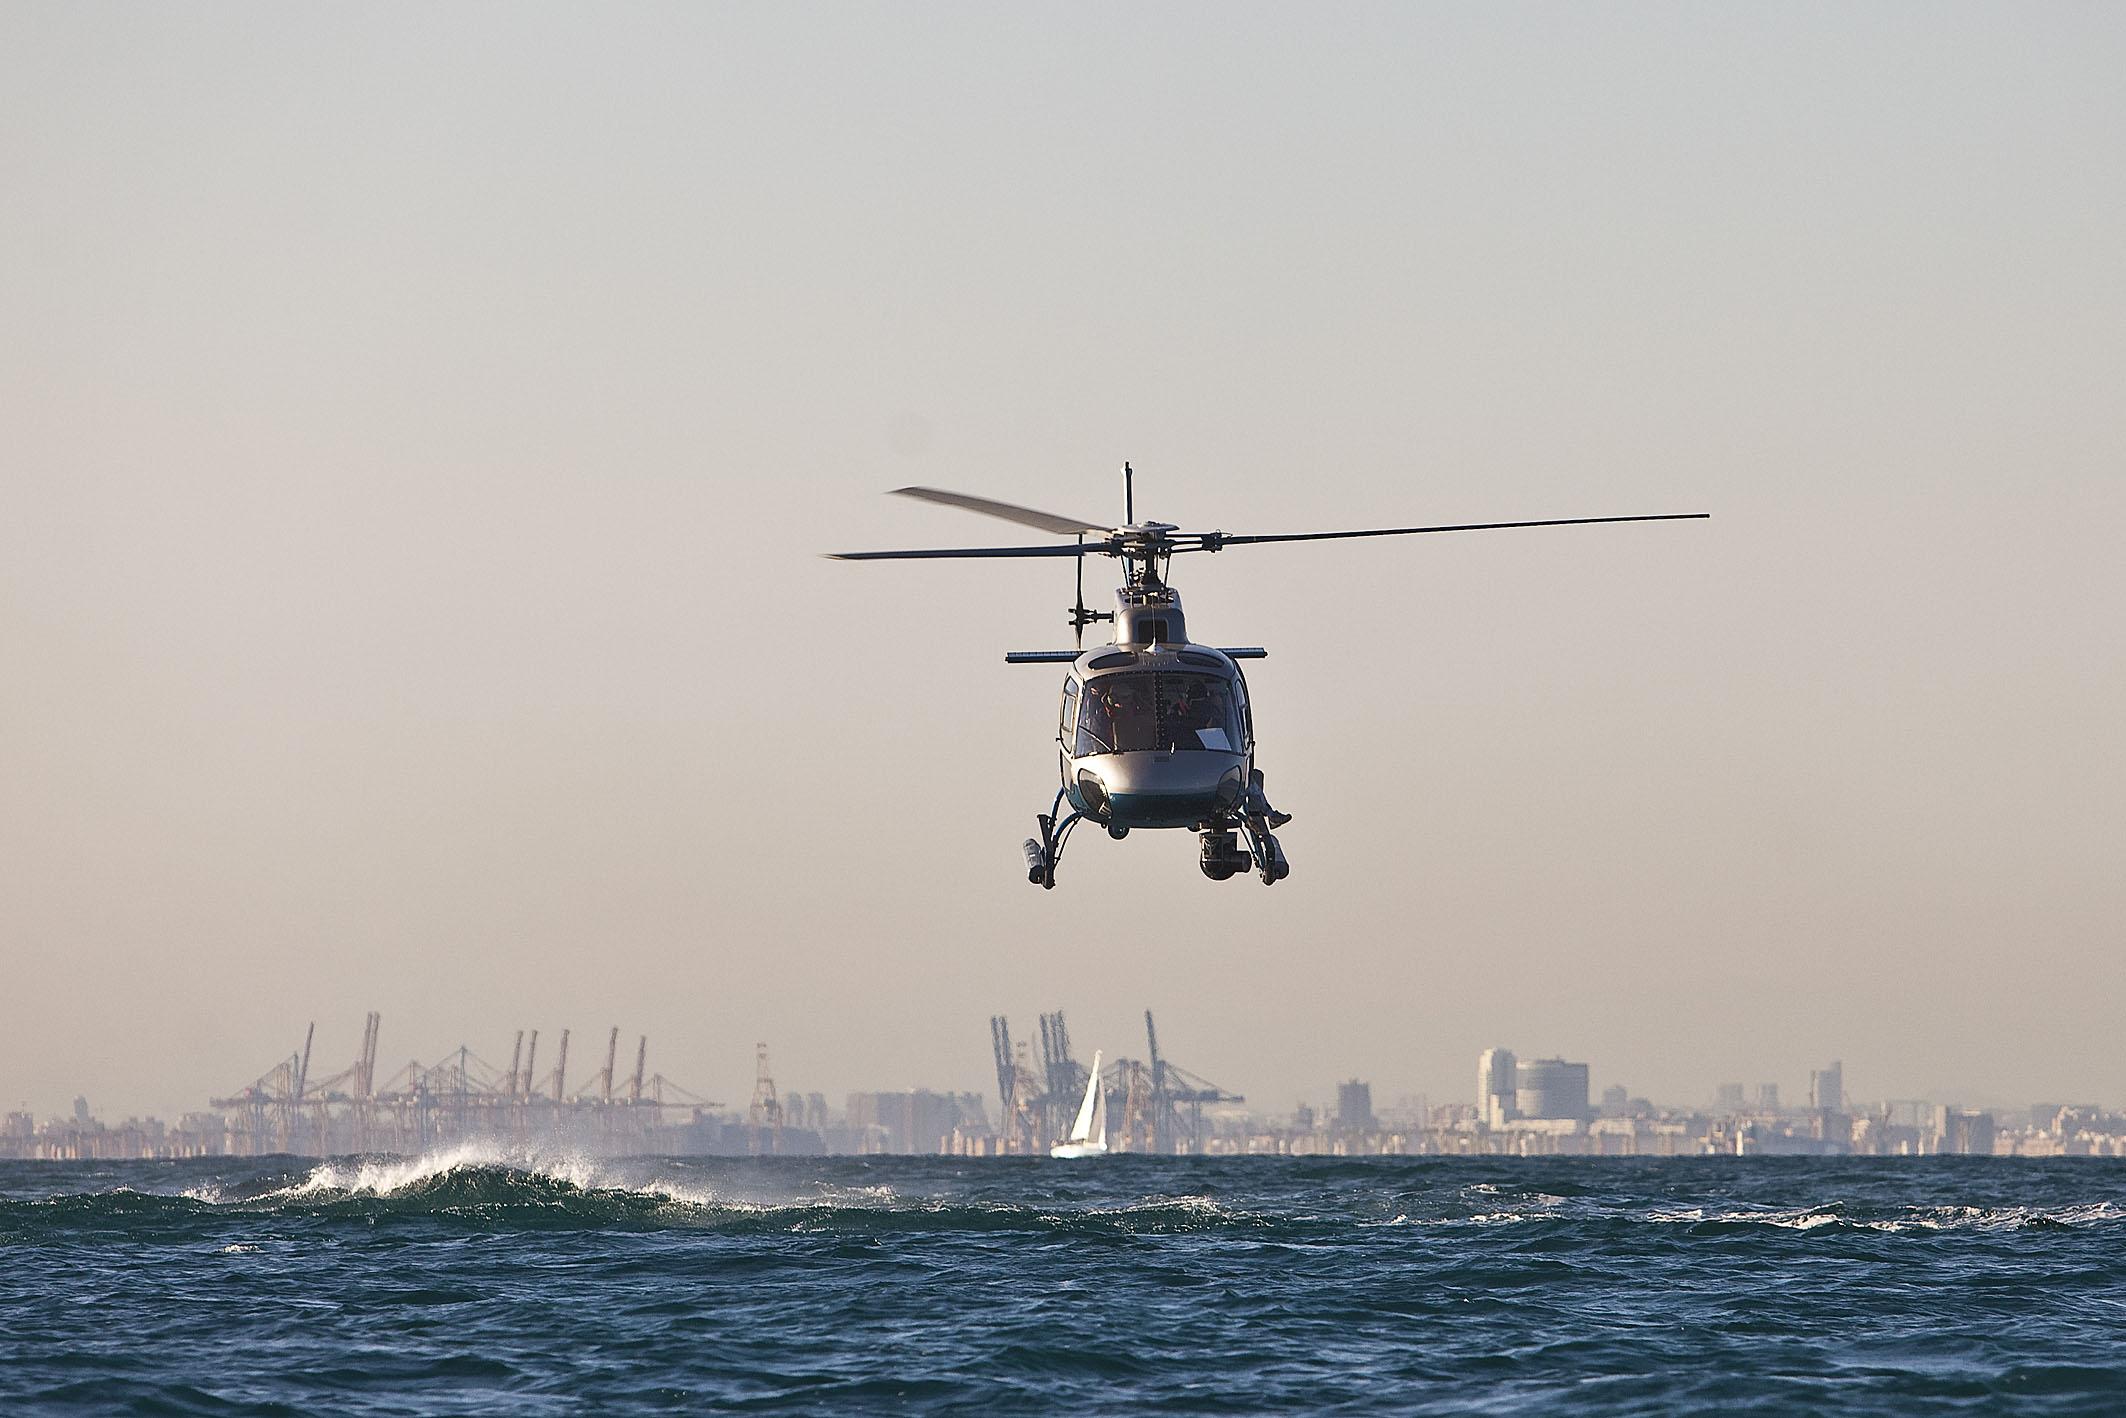 Bretagne Hélicoptères